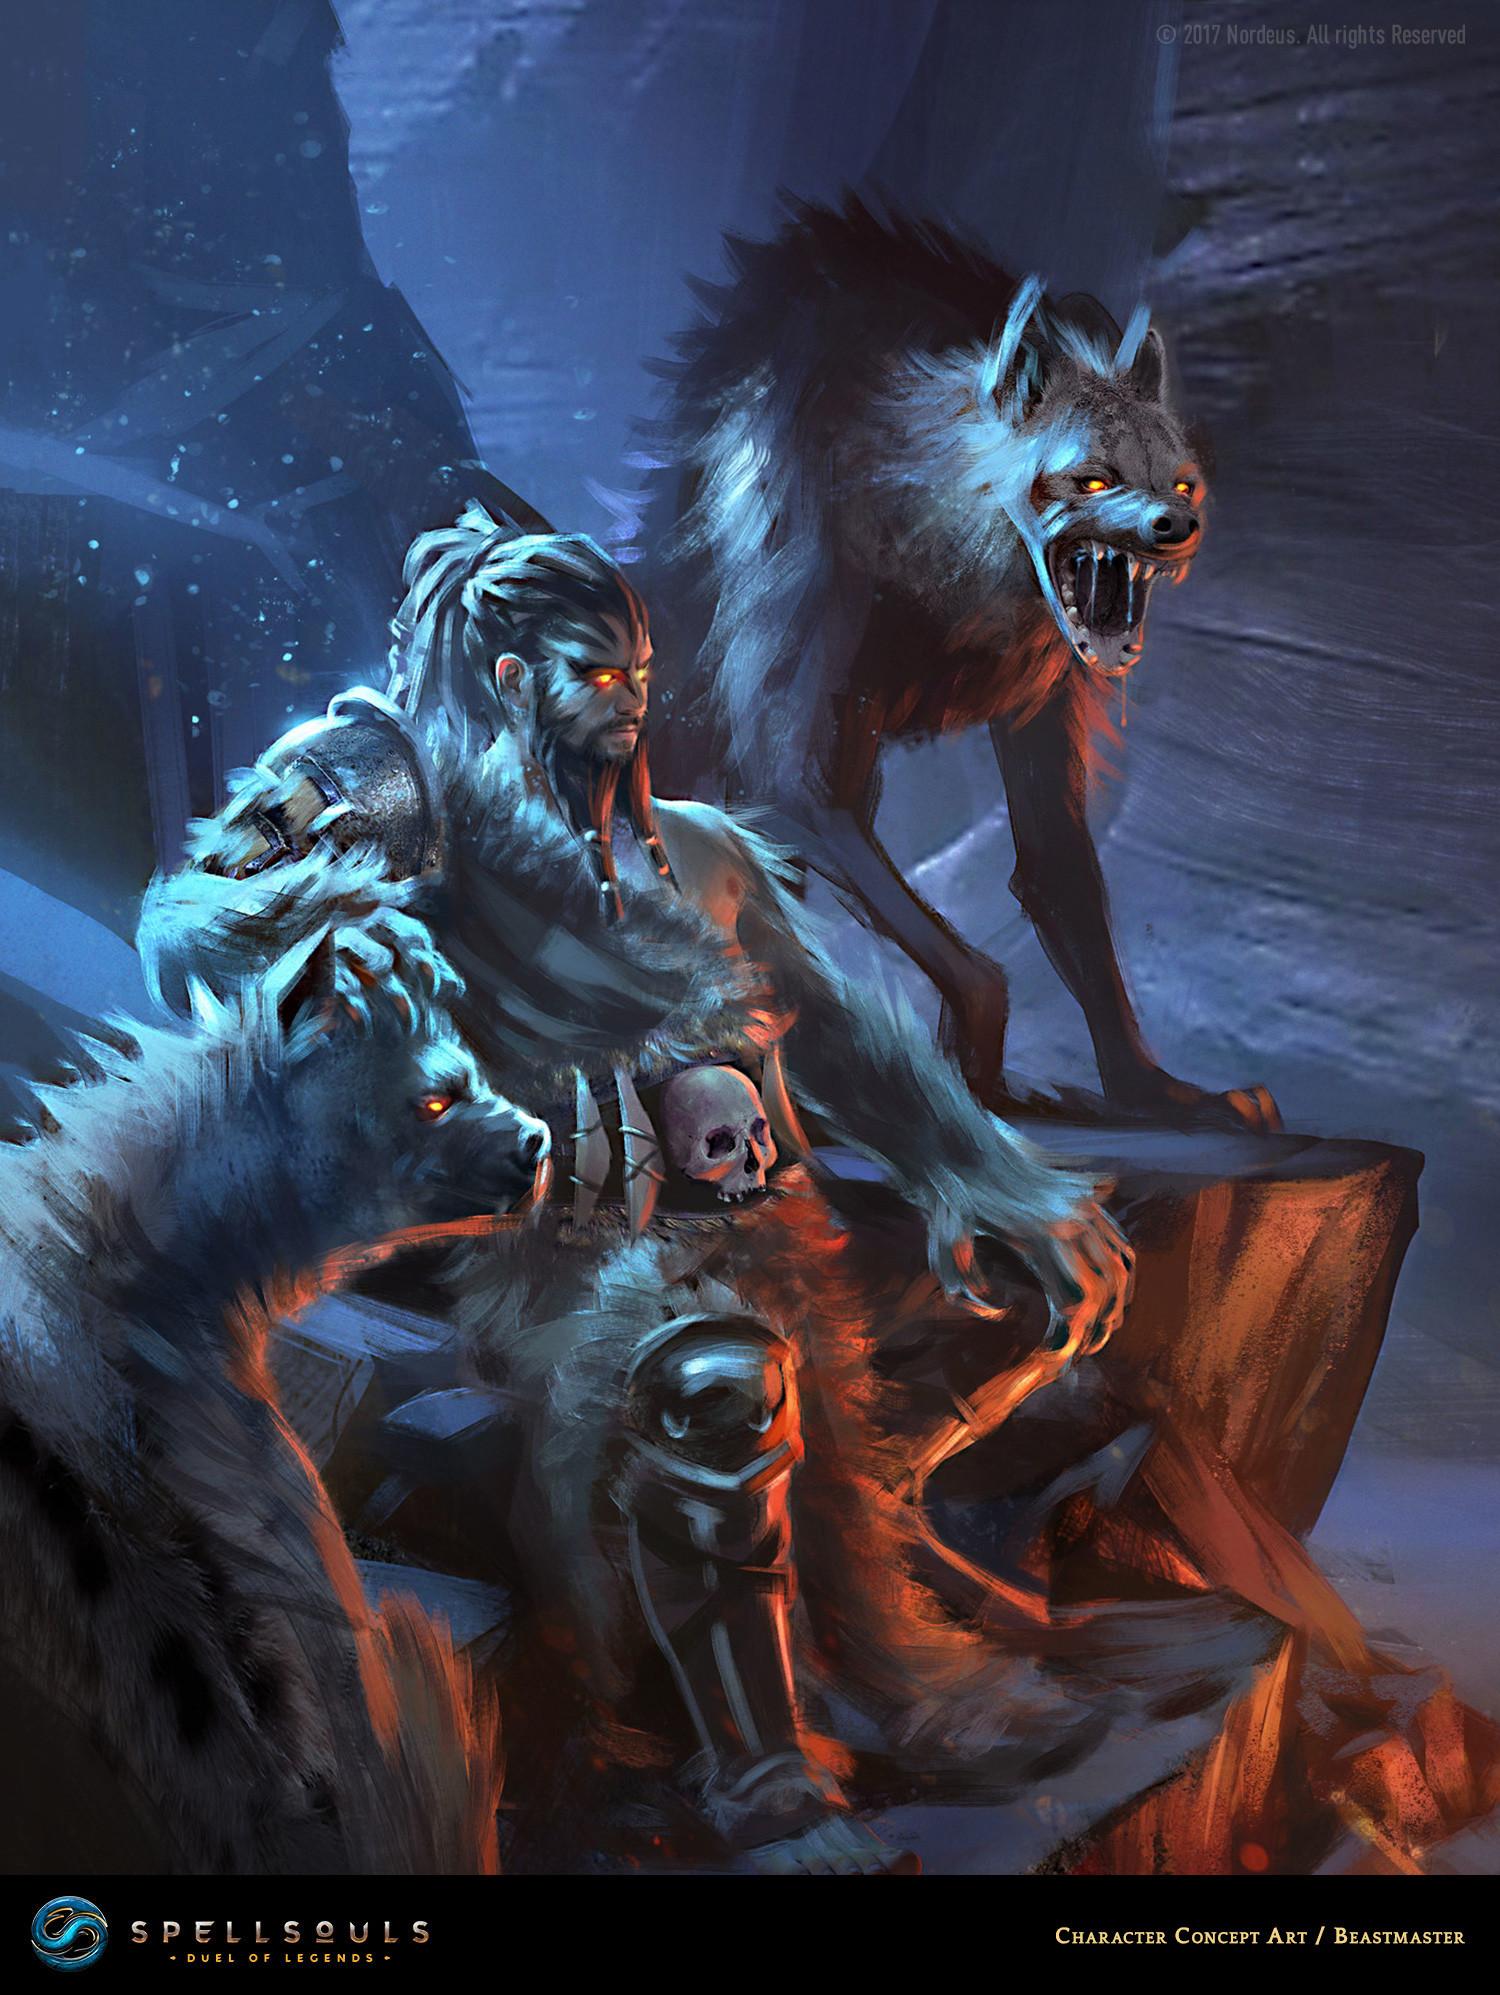 Resultado de imagem para beastmaster characters